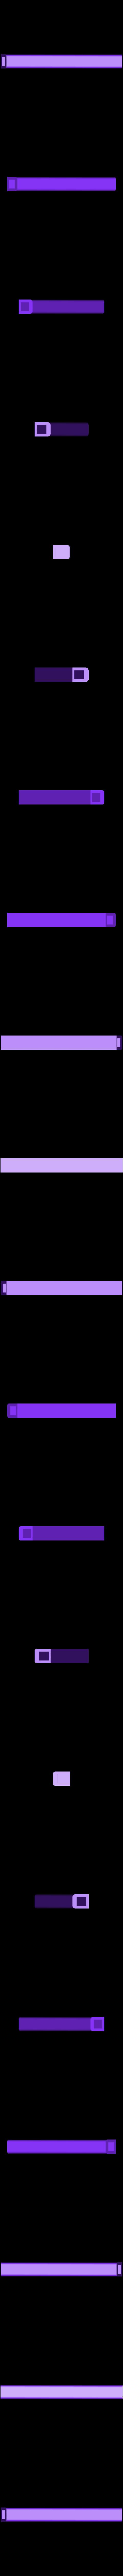 3-front_bridge.stl Download free STL file OpenRC Tractor • 3D printable object, makitpro